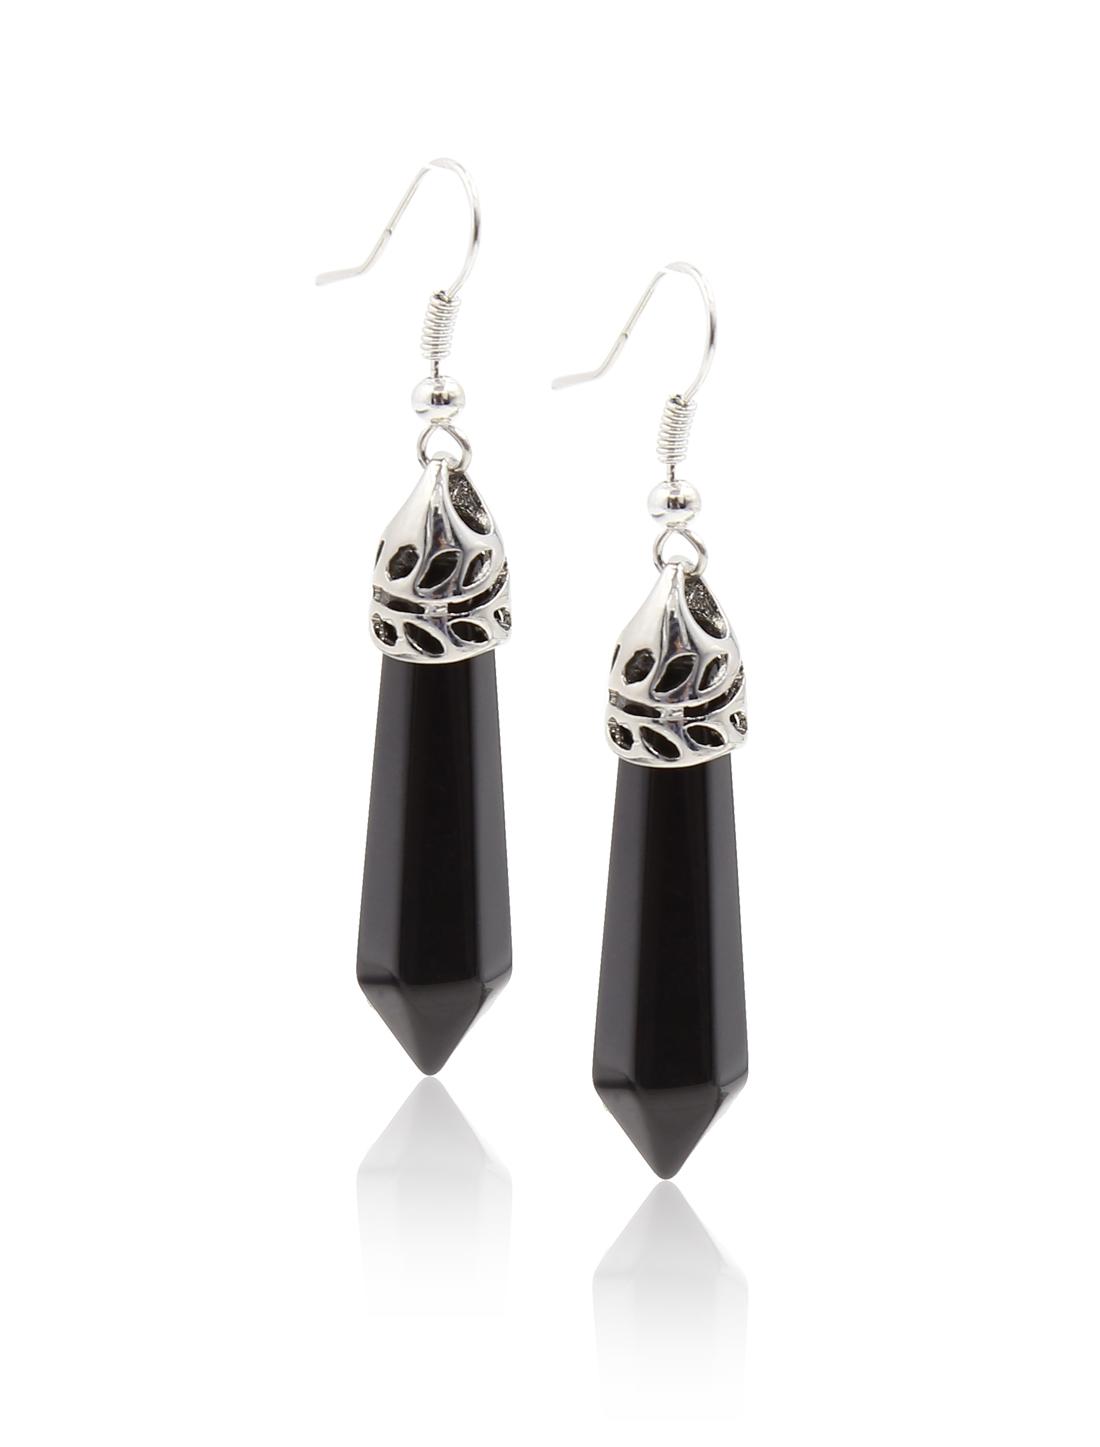 Black Agate Natural Gemstone Healing Hexagonal Pointed Reiki Chakra Stud Earring